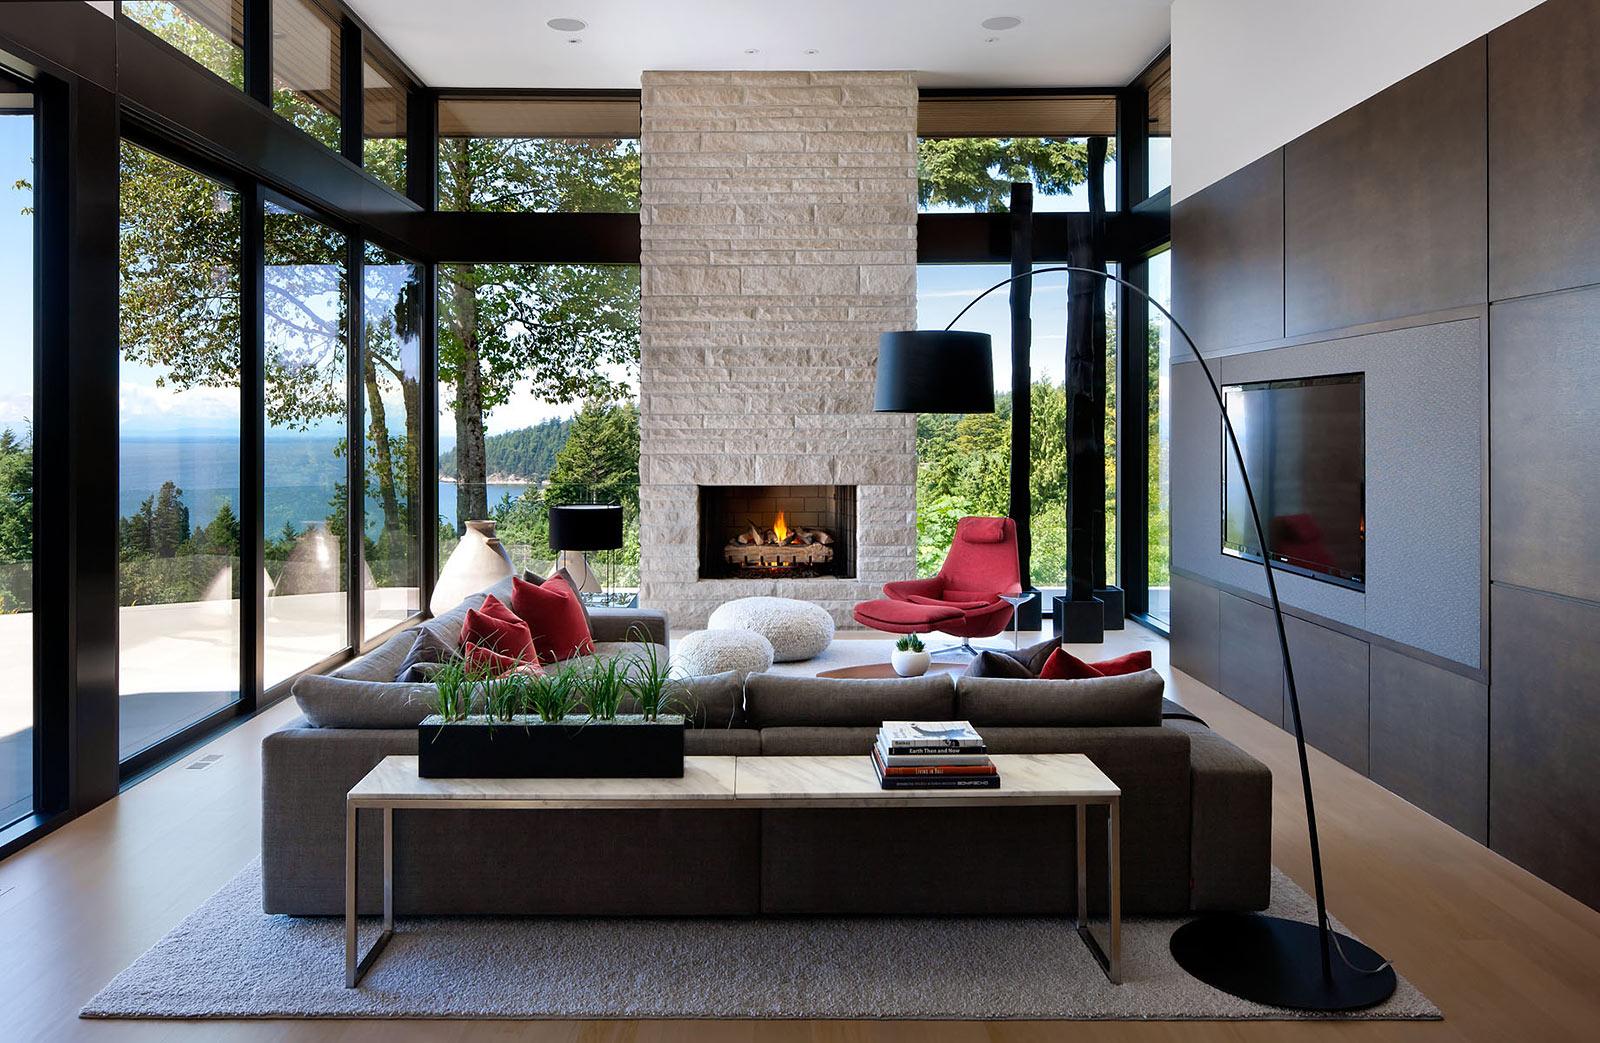 House furnishing styles furnishing style modern TSTKOTP